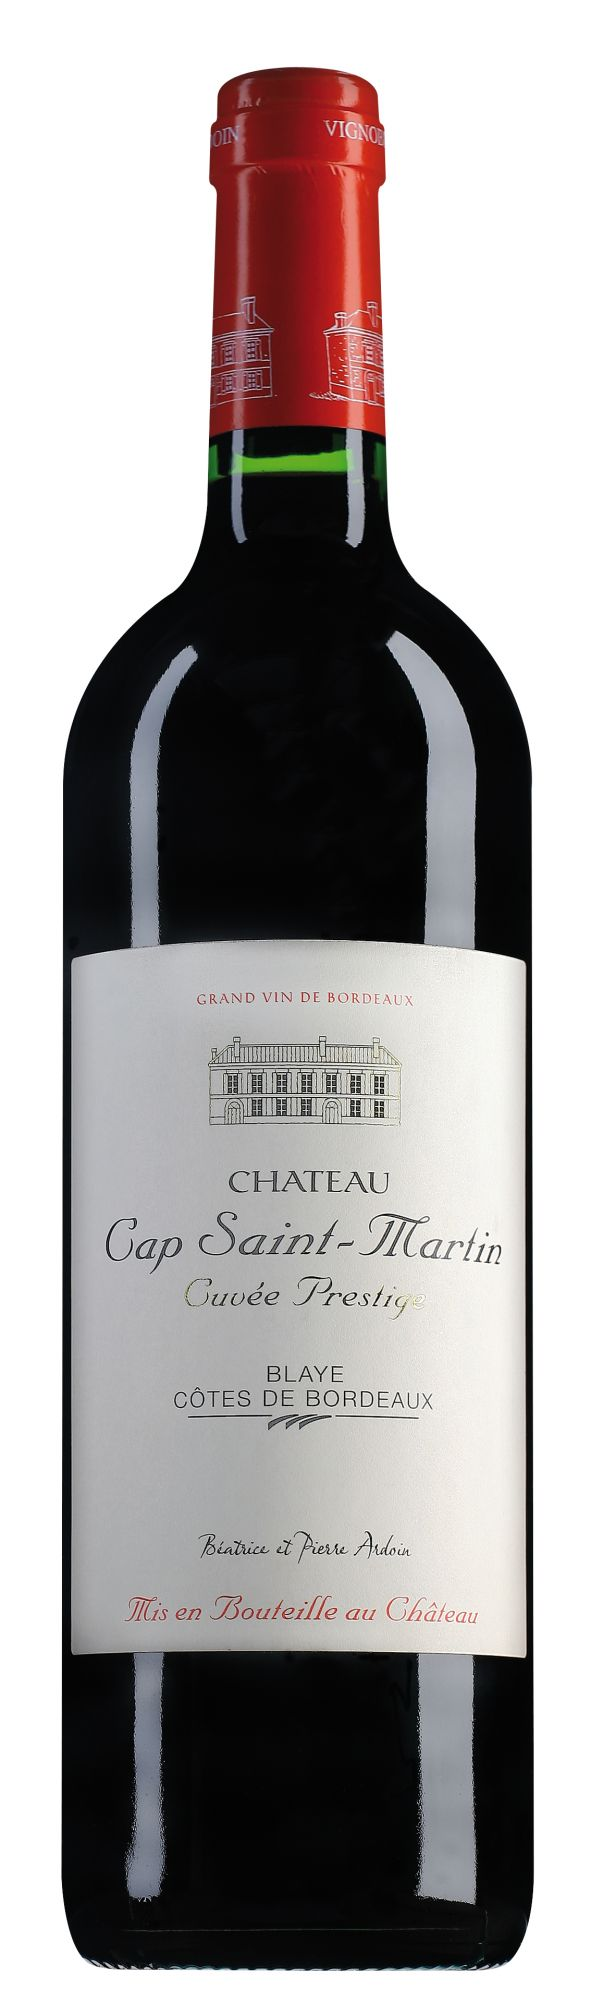 Château Cap Saint-Martin Blaye Côtes de Bordeaux Cuvée Prestige bij 6 flessen in originele kist